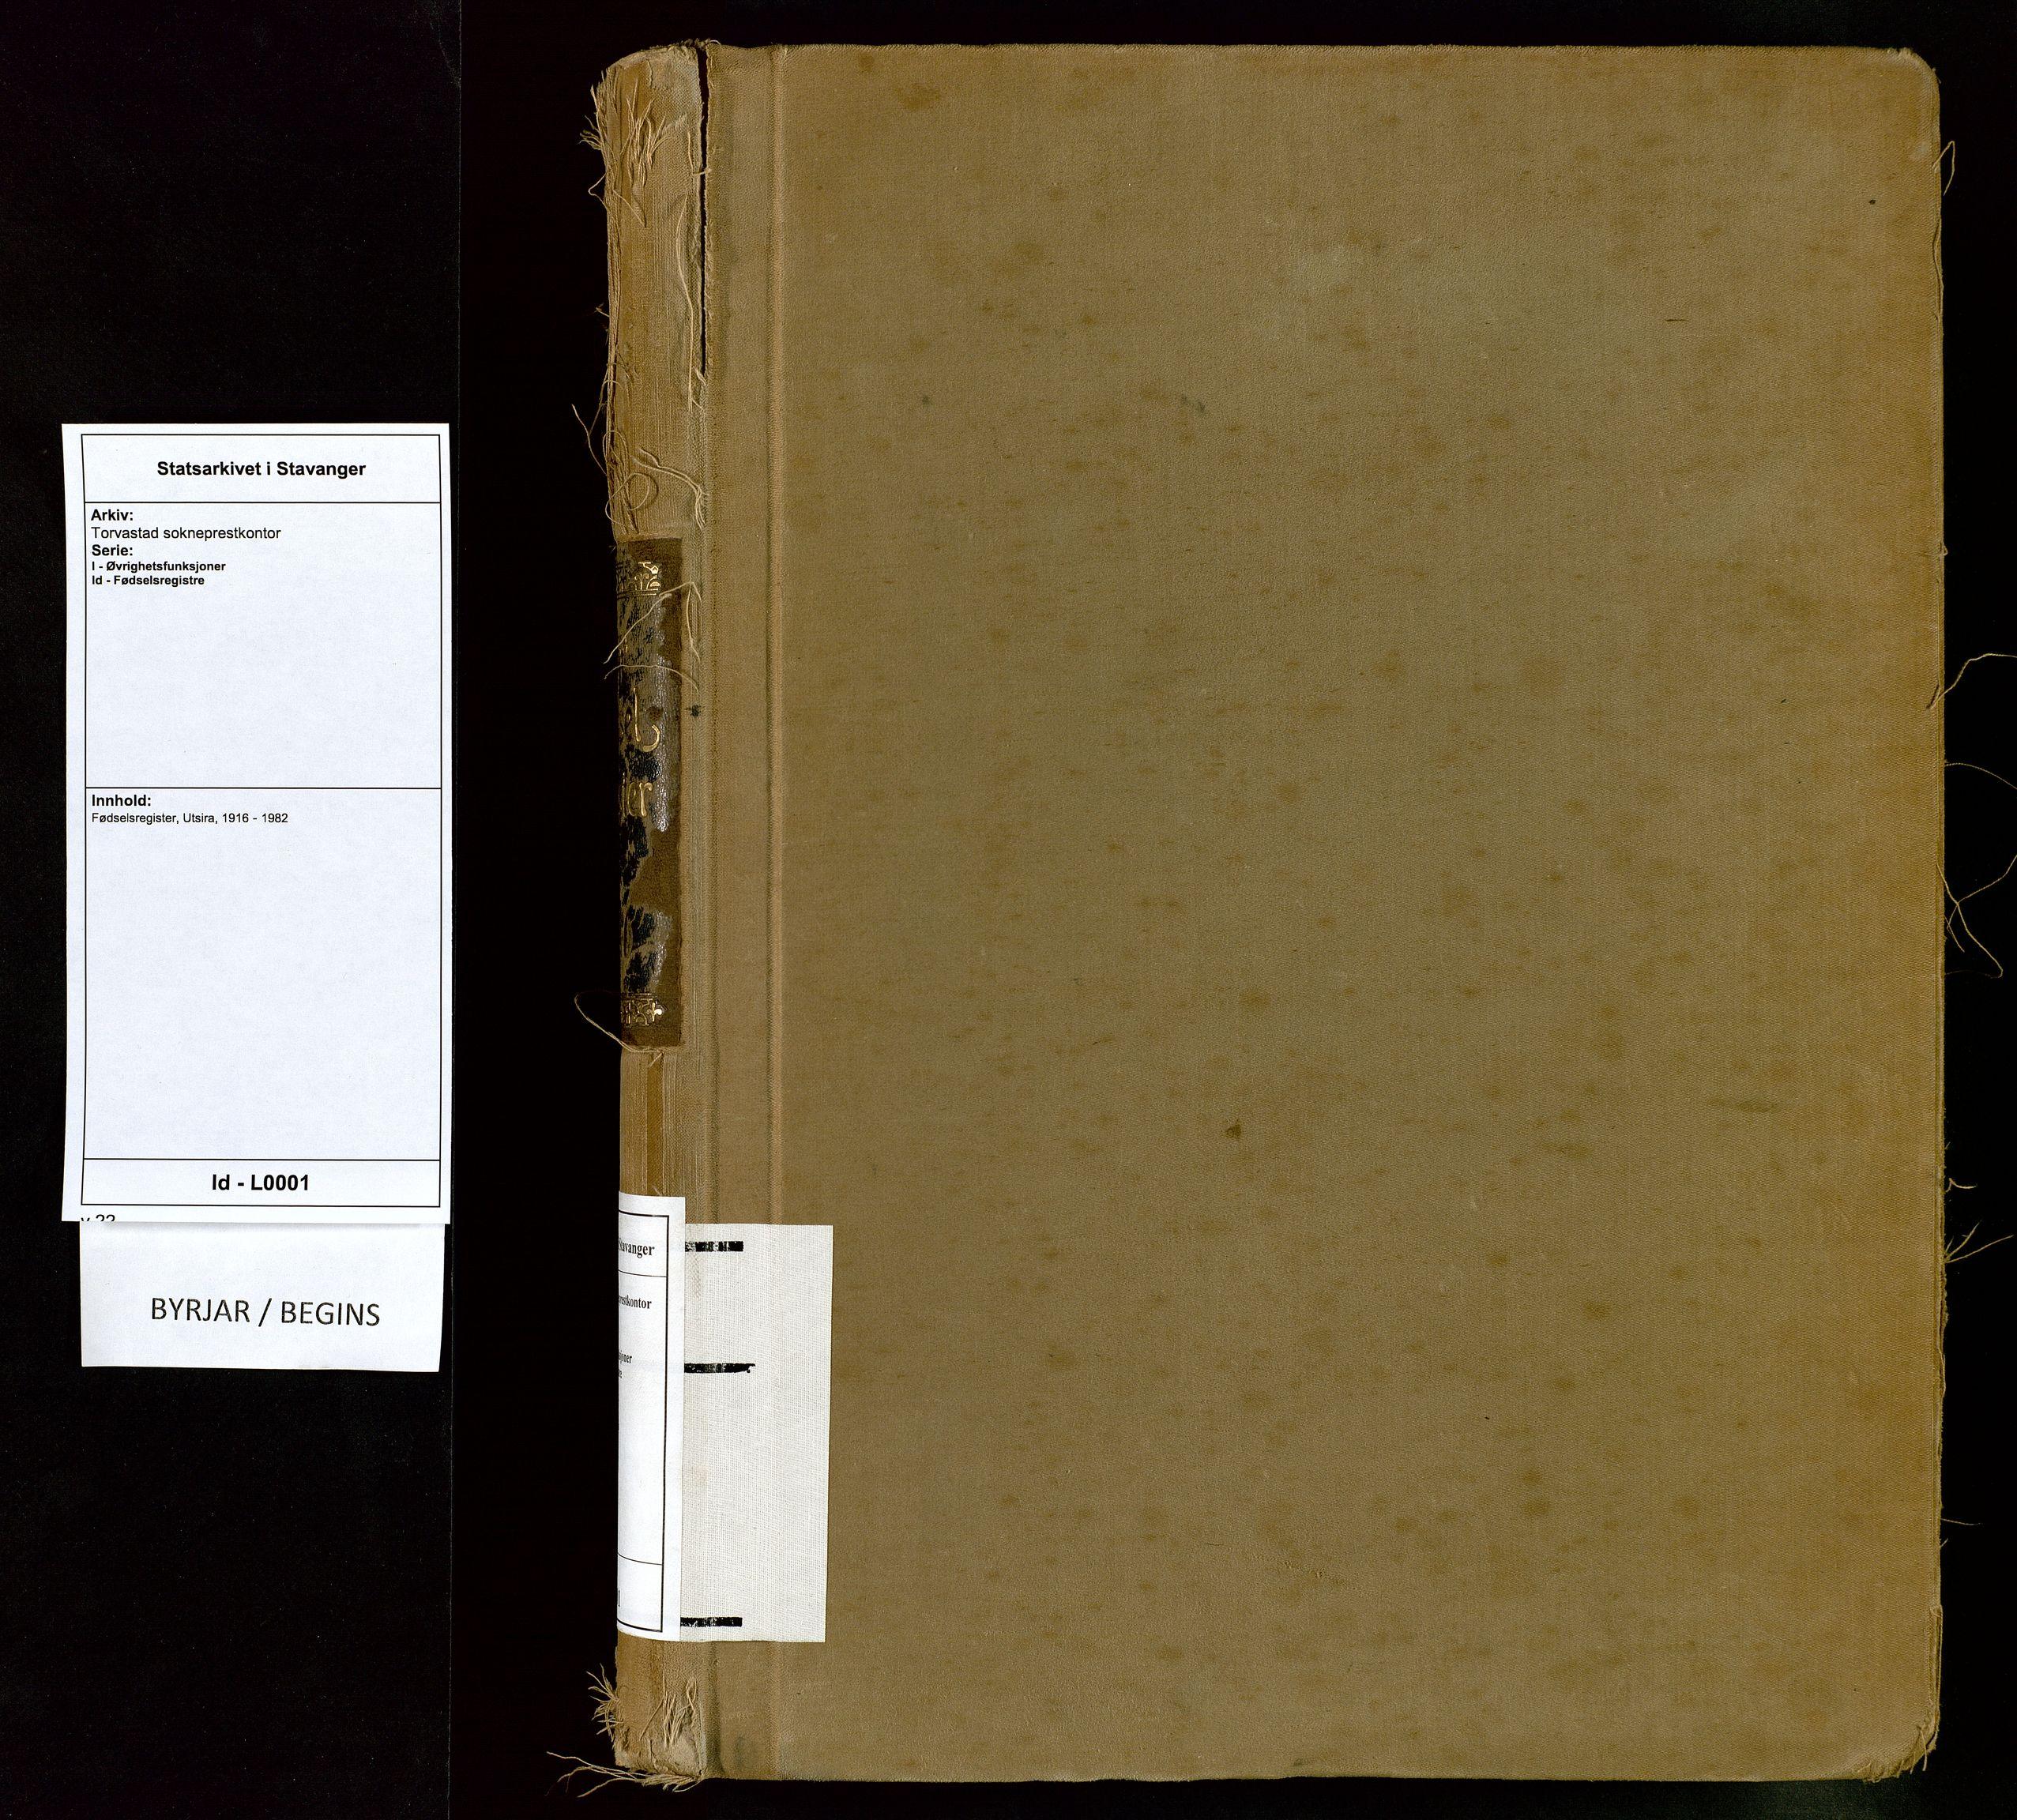 SAST, Torvastad sokneprestkontor, I/Id/L0001: Fødselsregister nr. 1, 1916-1982